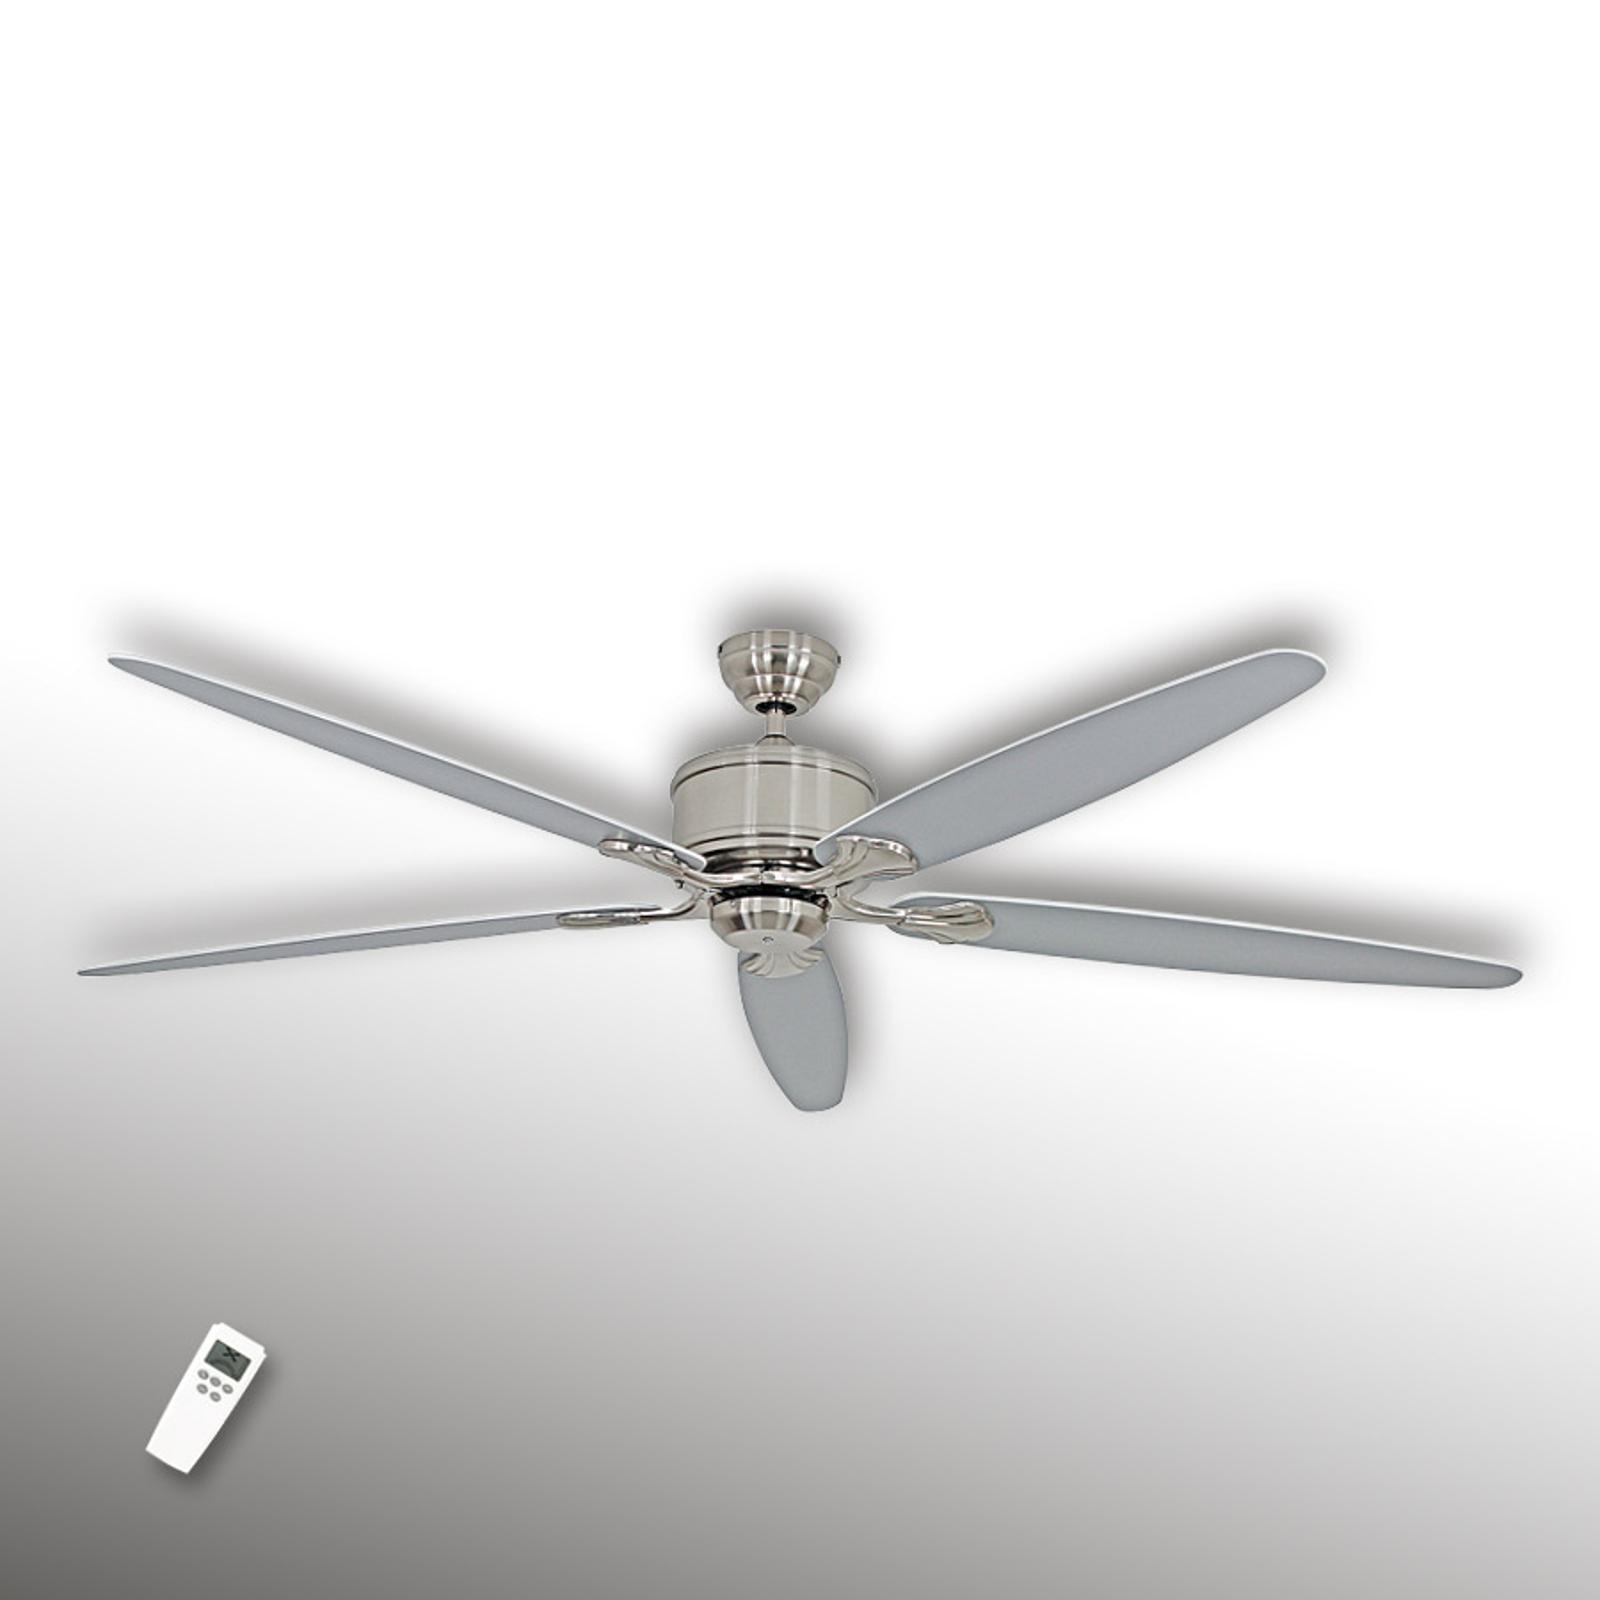 Sparsamer Deckenventilator Eco Elements, chrom